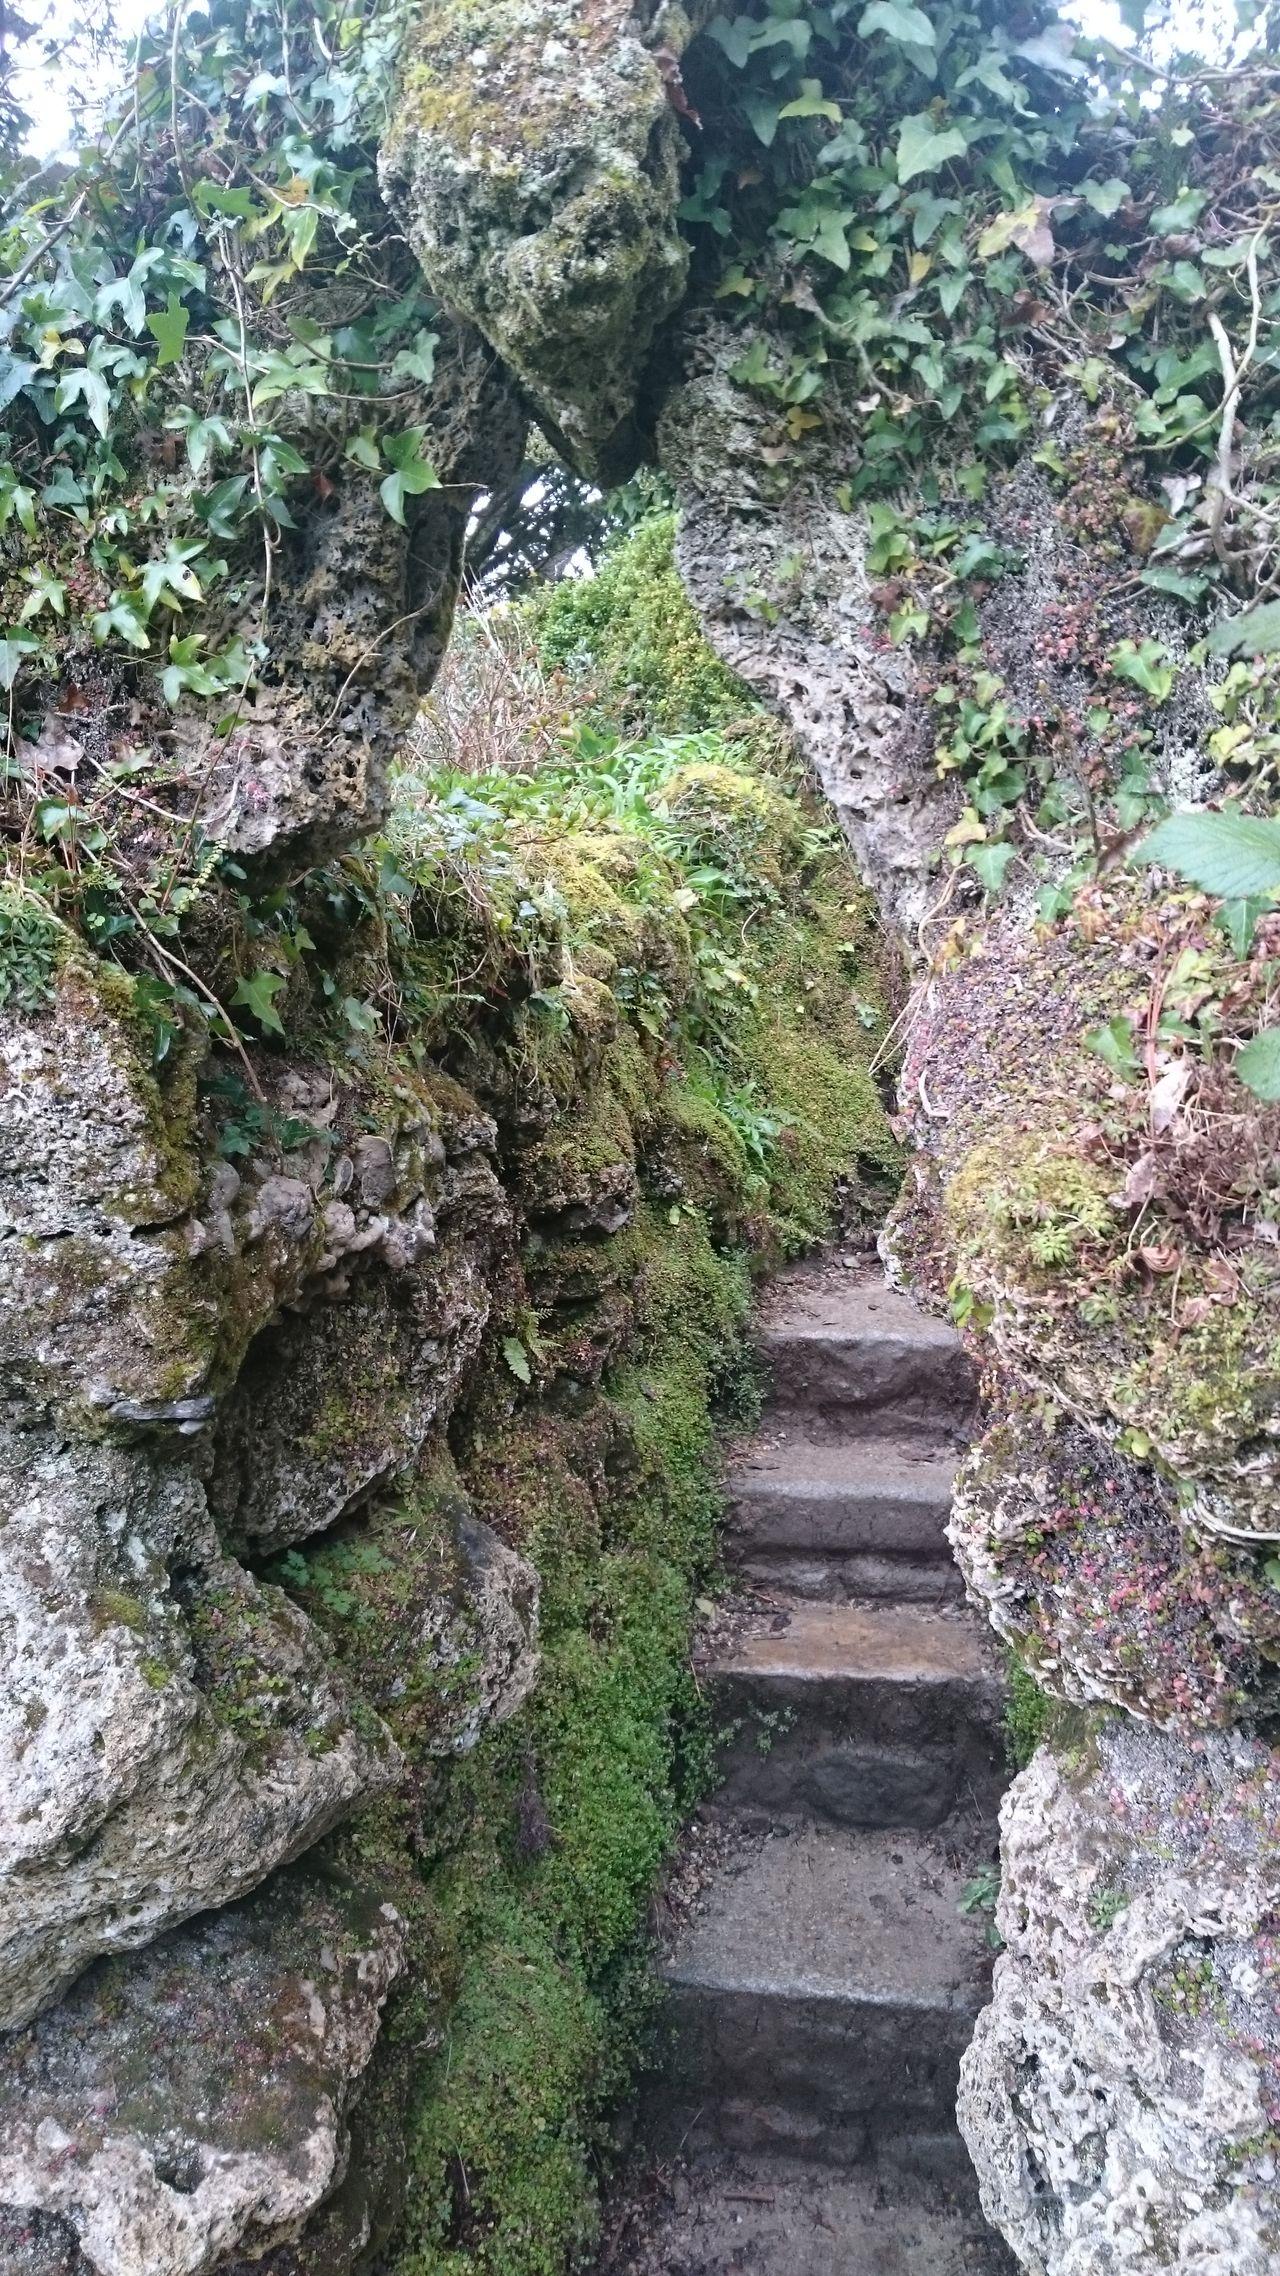 Growth Outdoors Nature No People Beauty In Nature Hiddenface Stone Garden Powerscourt Garden Ireland🍀